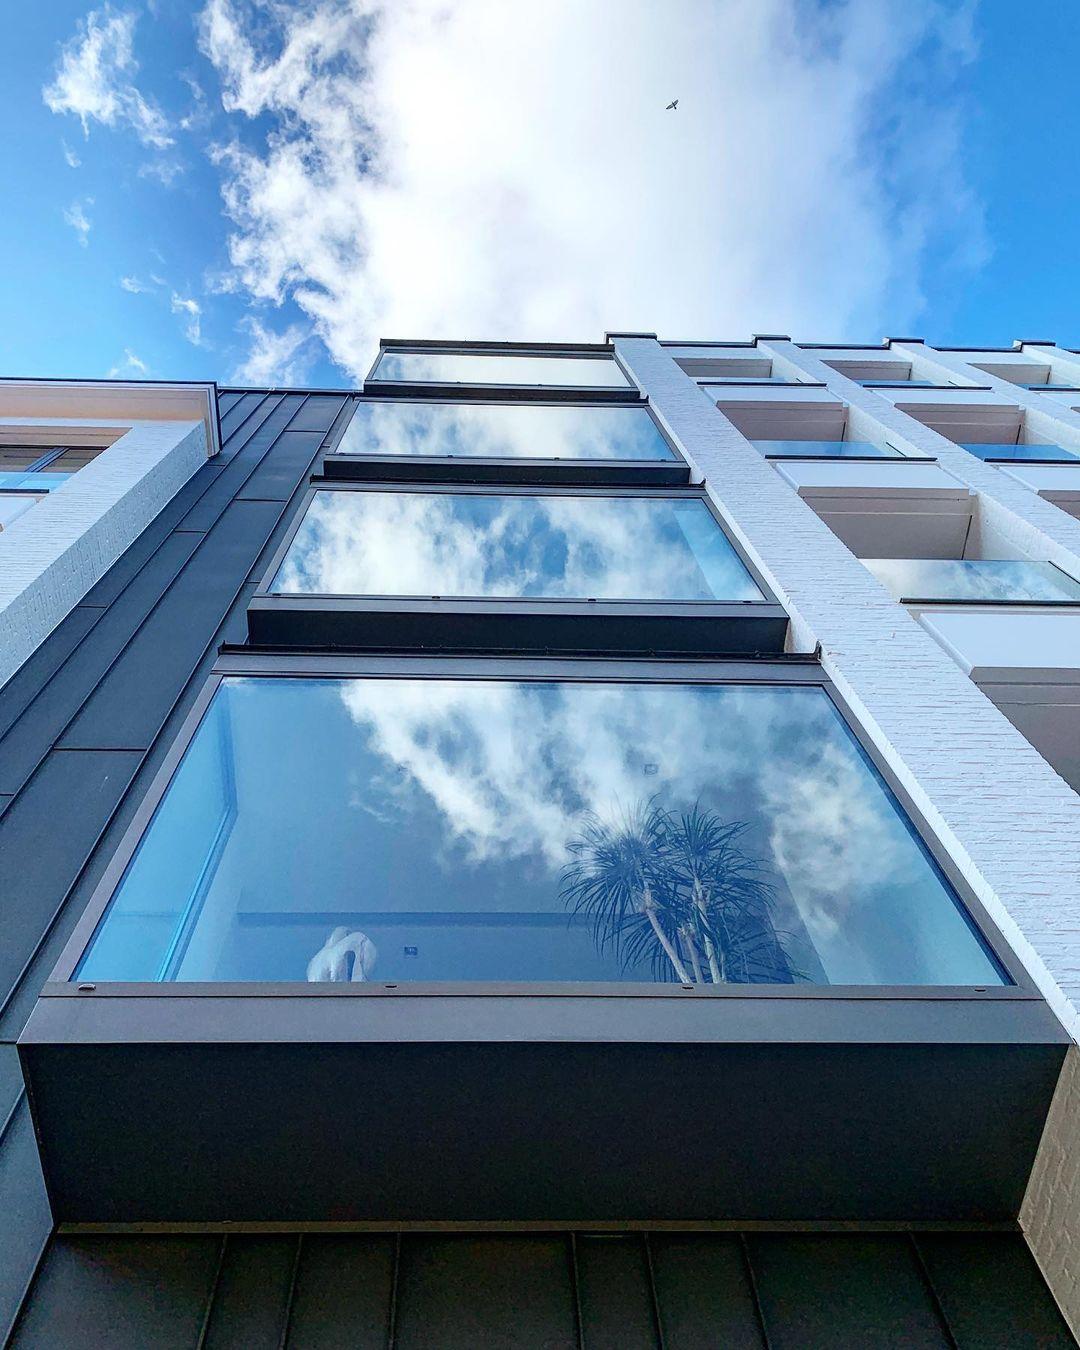 2020 02 25 B9AWlUBAtnE 2251899134820932036 | Baeyens & Beck architecten Gent | architect nieuwbouw renovatie interieur | high end | architectenbureau